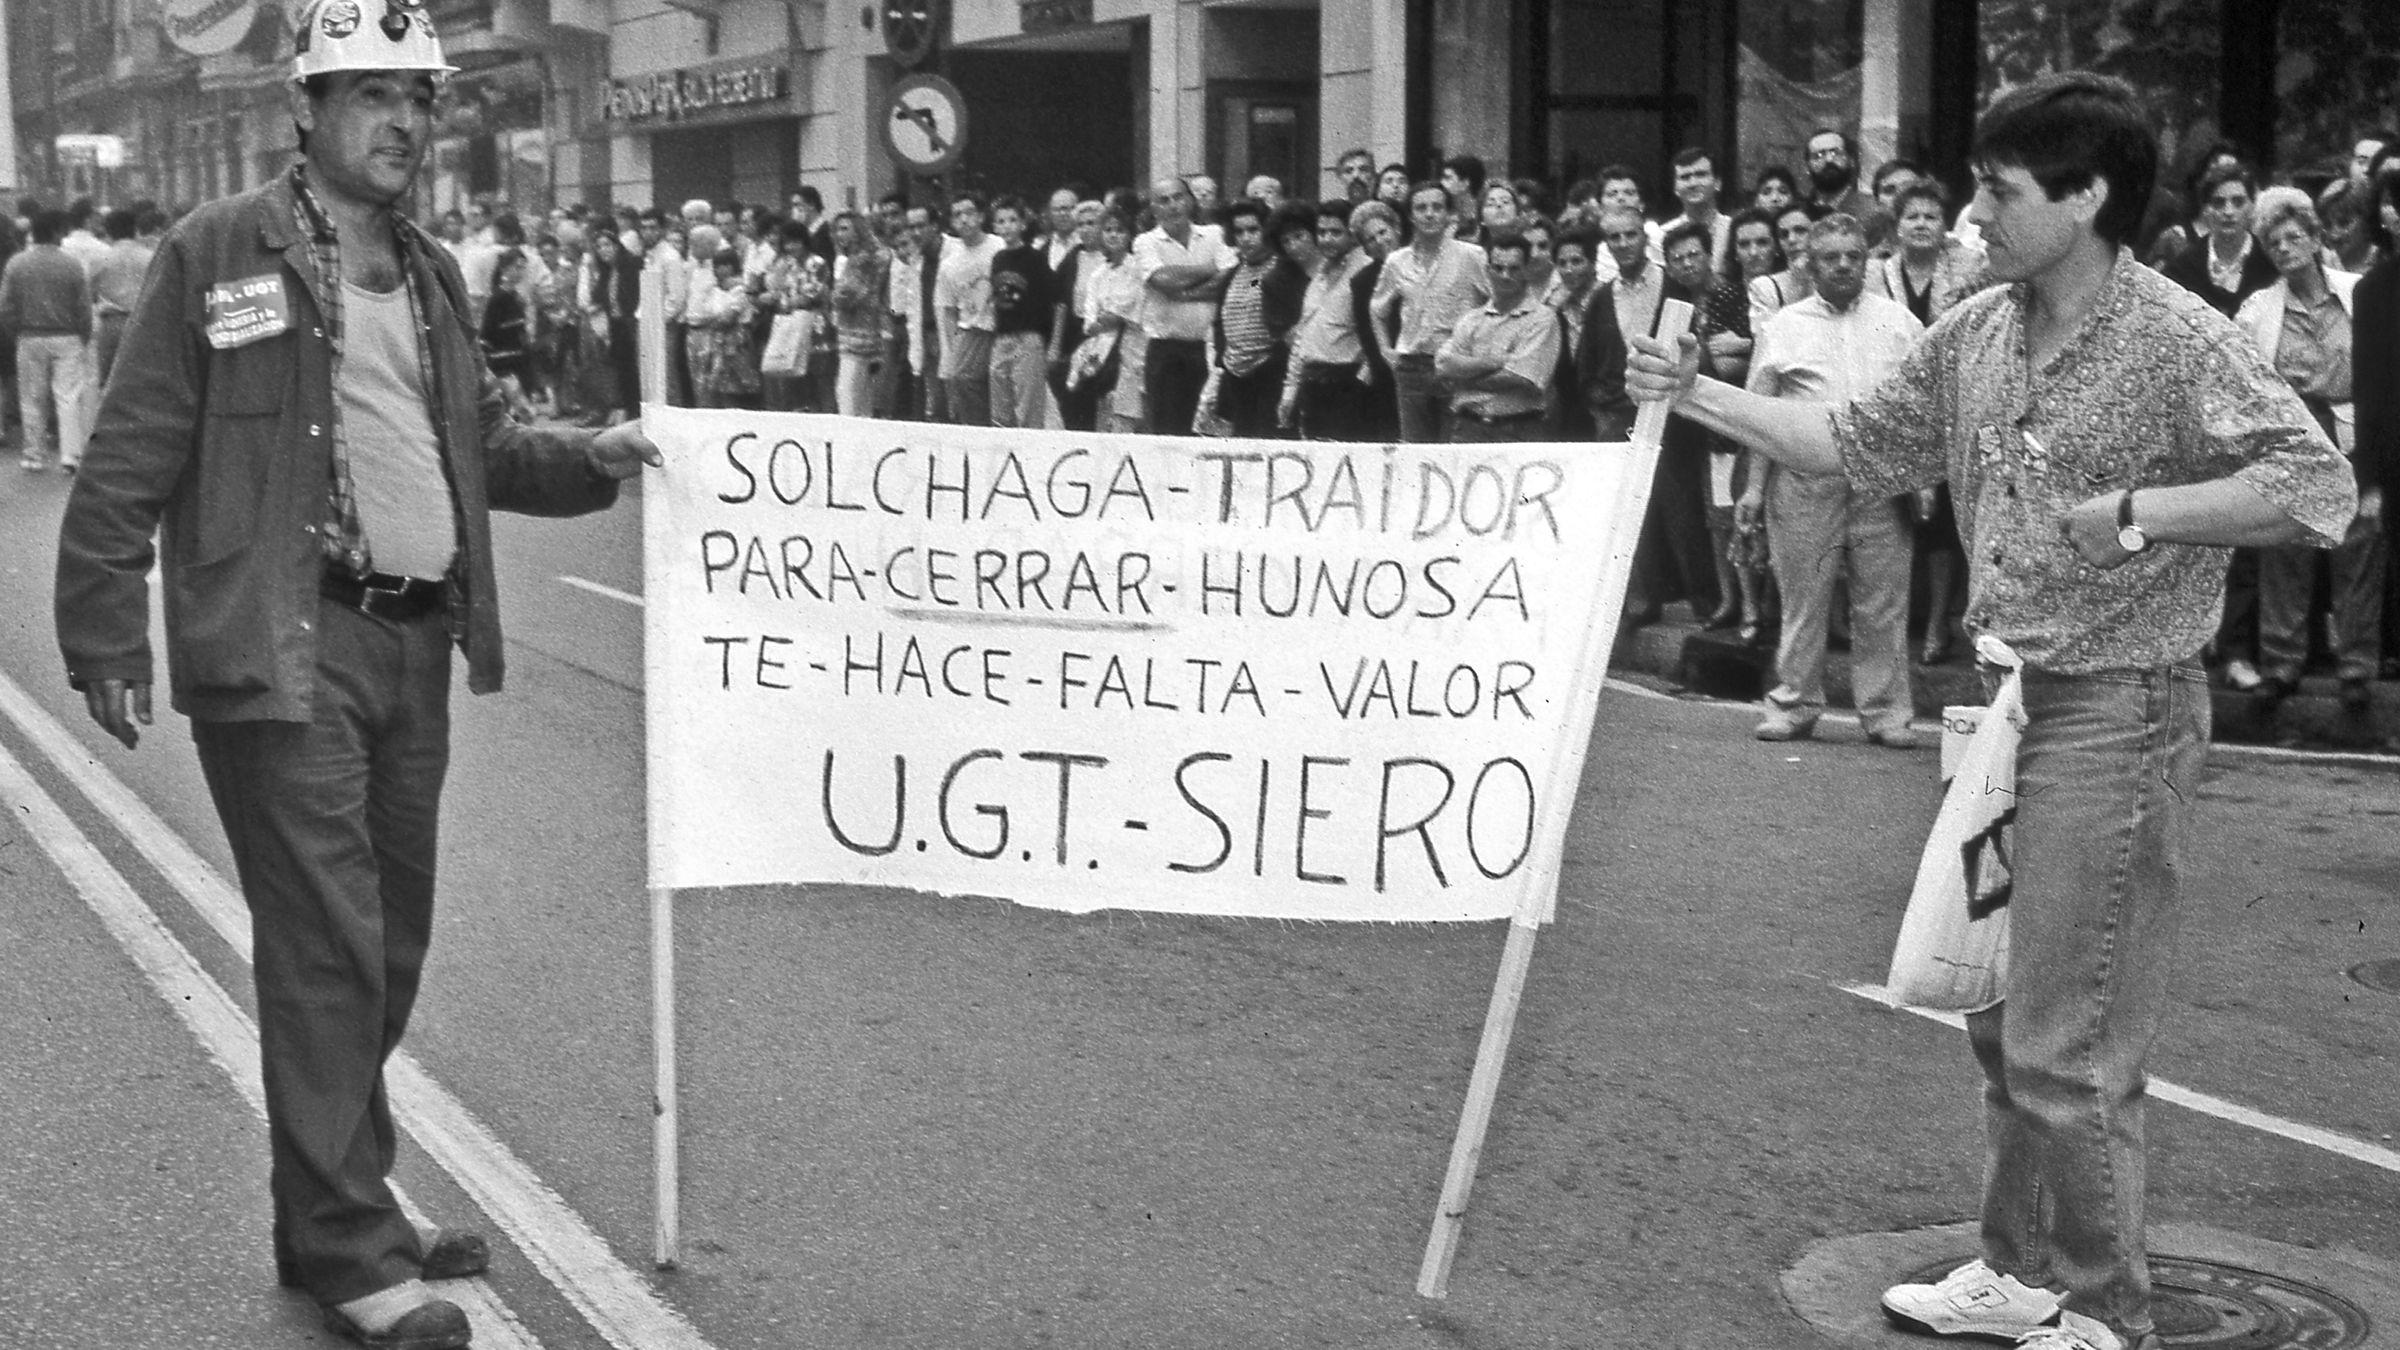 Huelga general en Asturias. 23 de Octubre. Oviedo. Asturias 1991